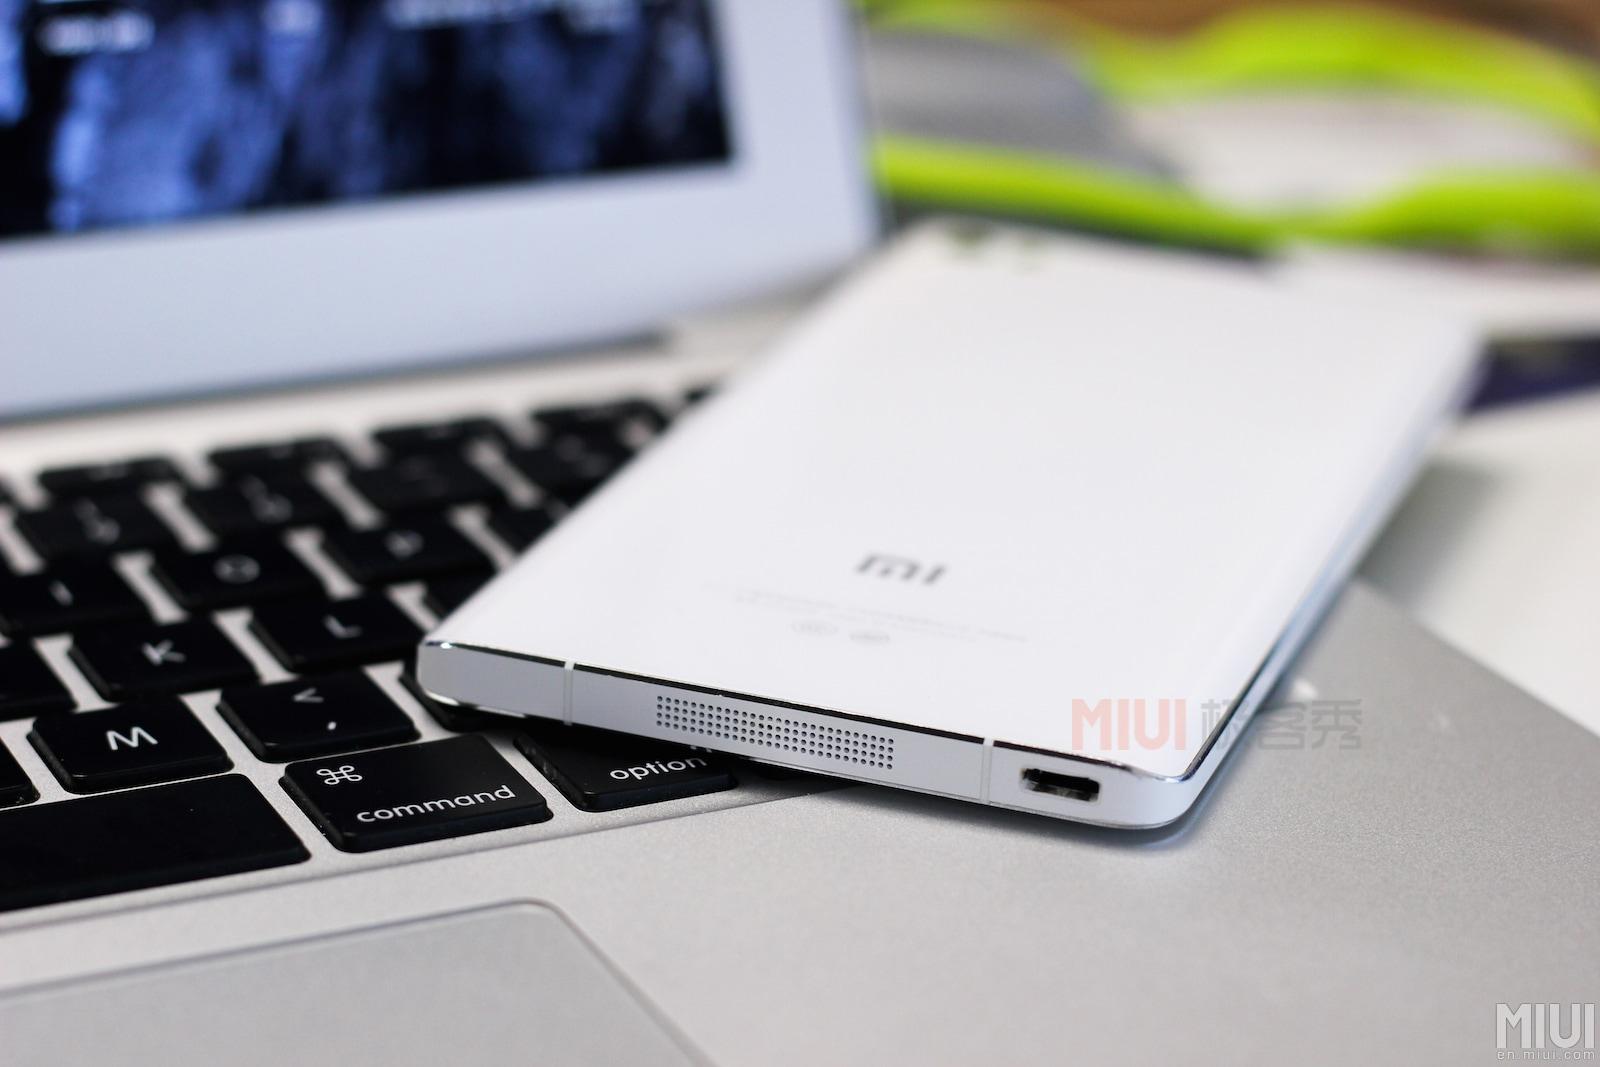 Xiaomi Mi Note hands-on close-up – 1